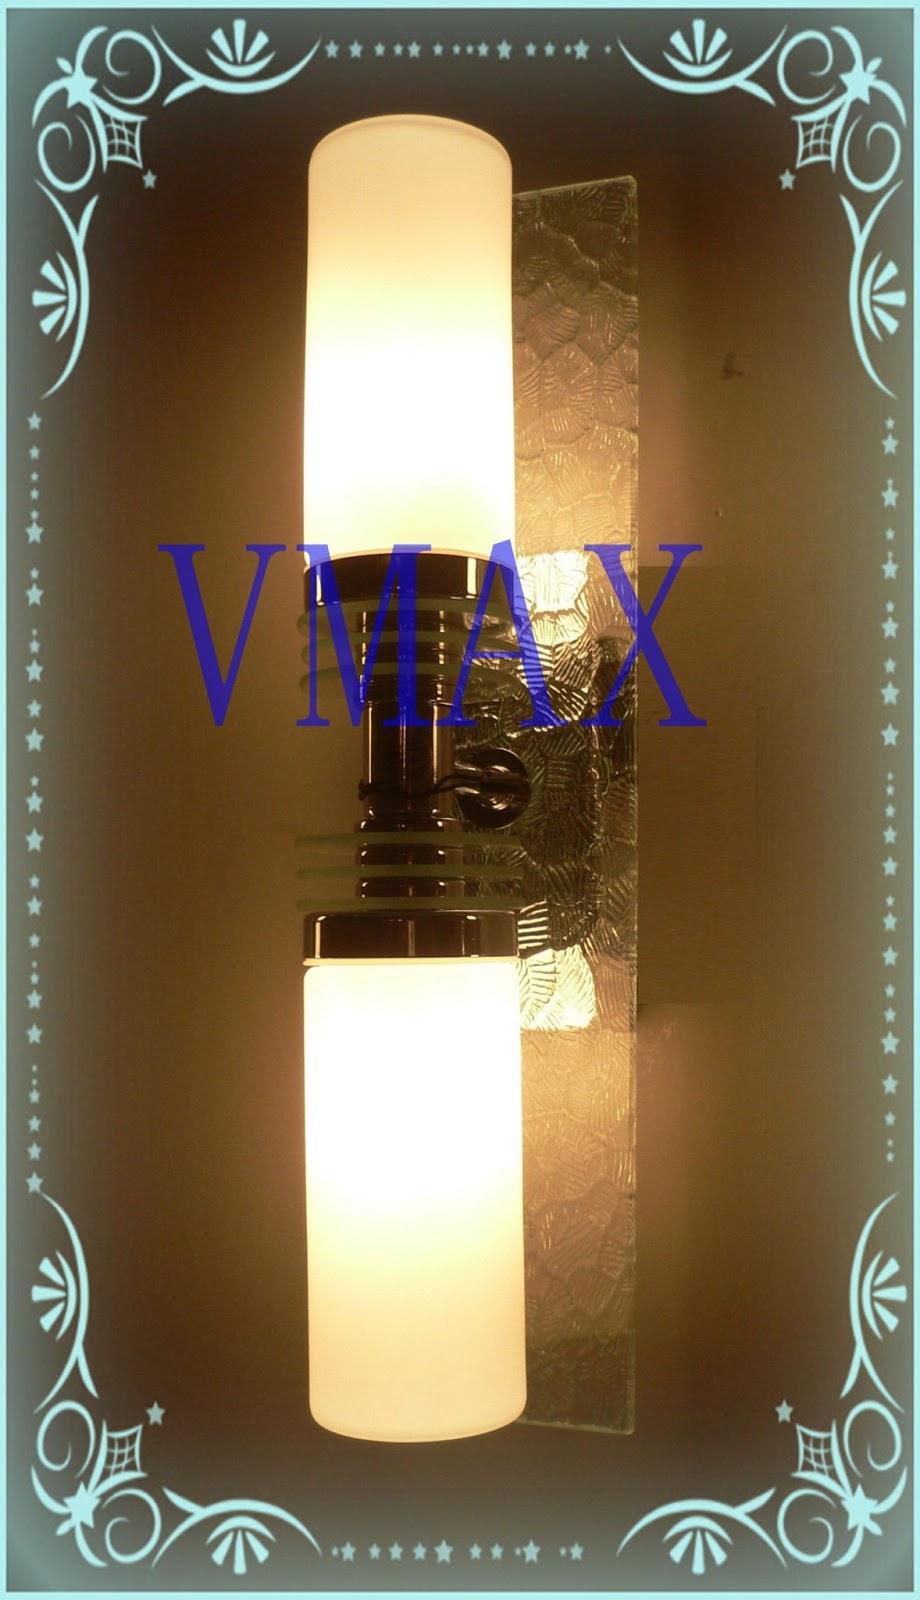 Wall Lamp Malaysia Wall Lamp Item W-9916/2l